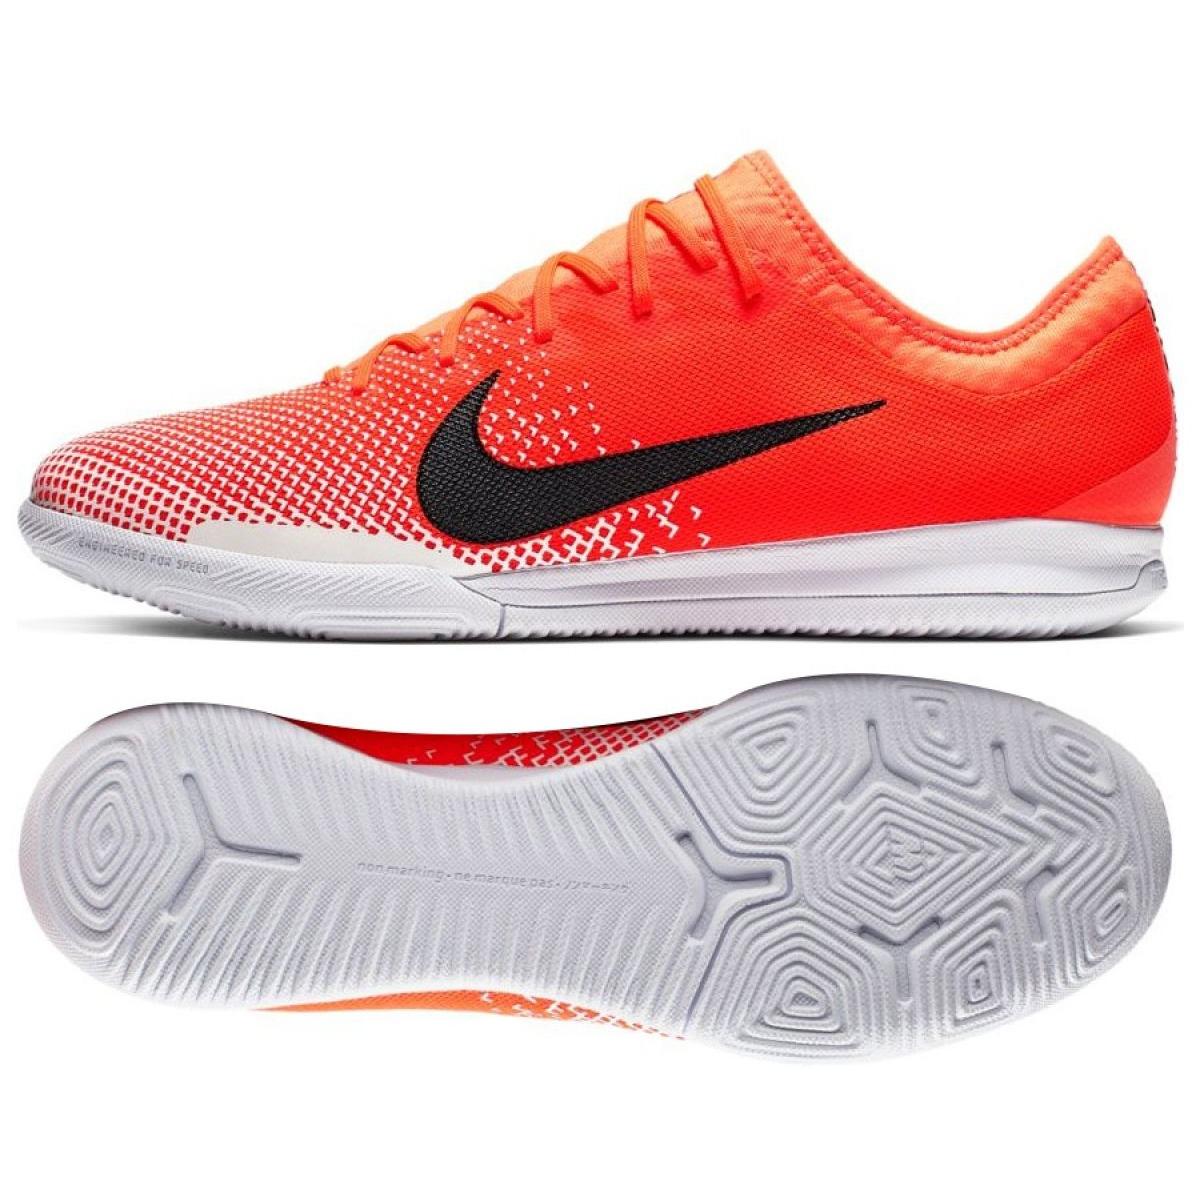 Hallenschuhe Nike Mercurial Vapor 12 Pro Ic M Ah7387 801 Weiss Orange Rot